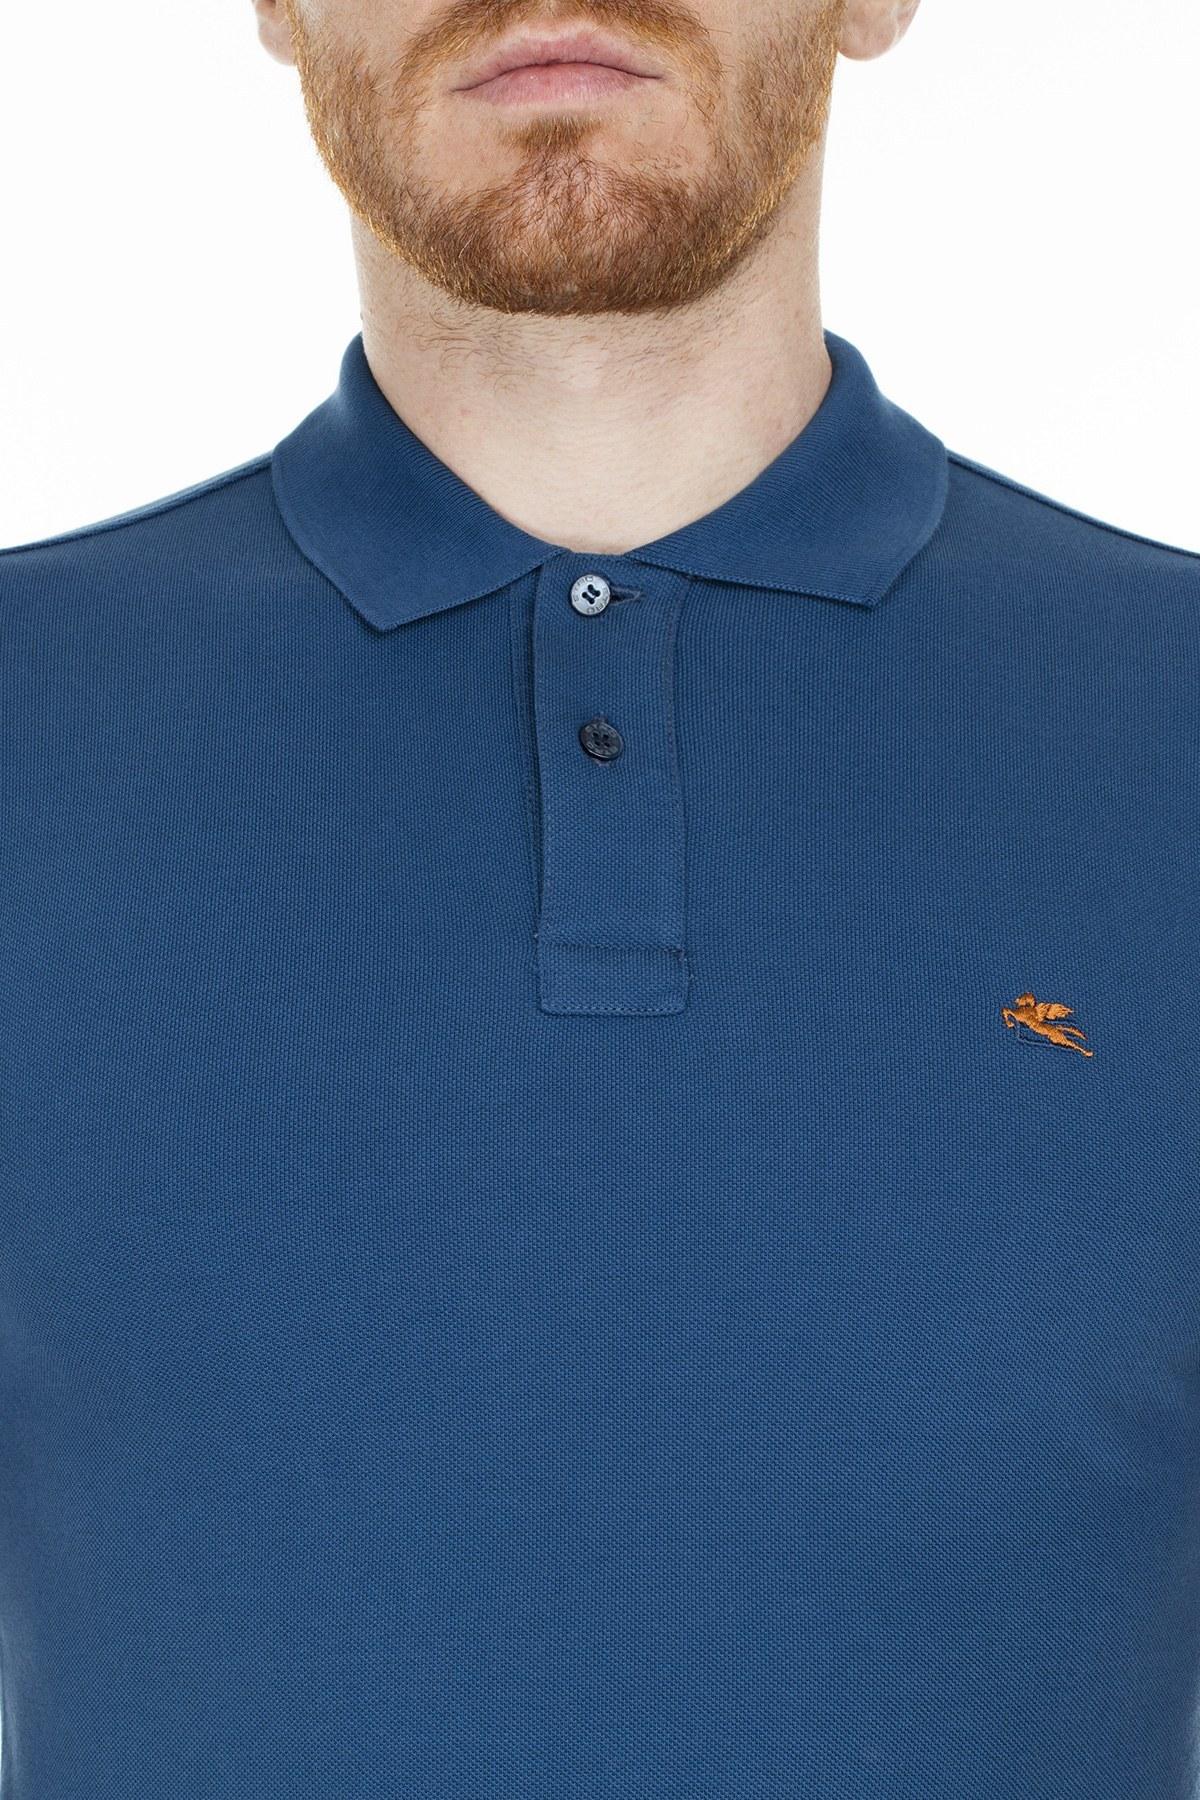 Etro Regular Fit T Shirt Erkek Polo 1Y140 9240 201 MAVİ